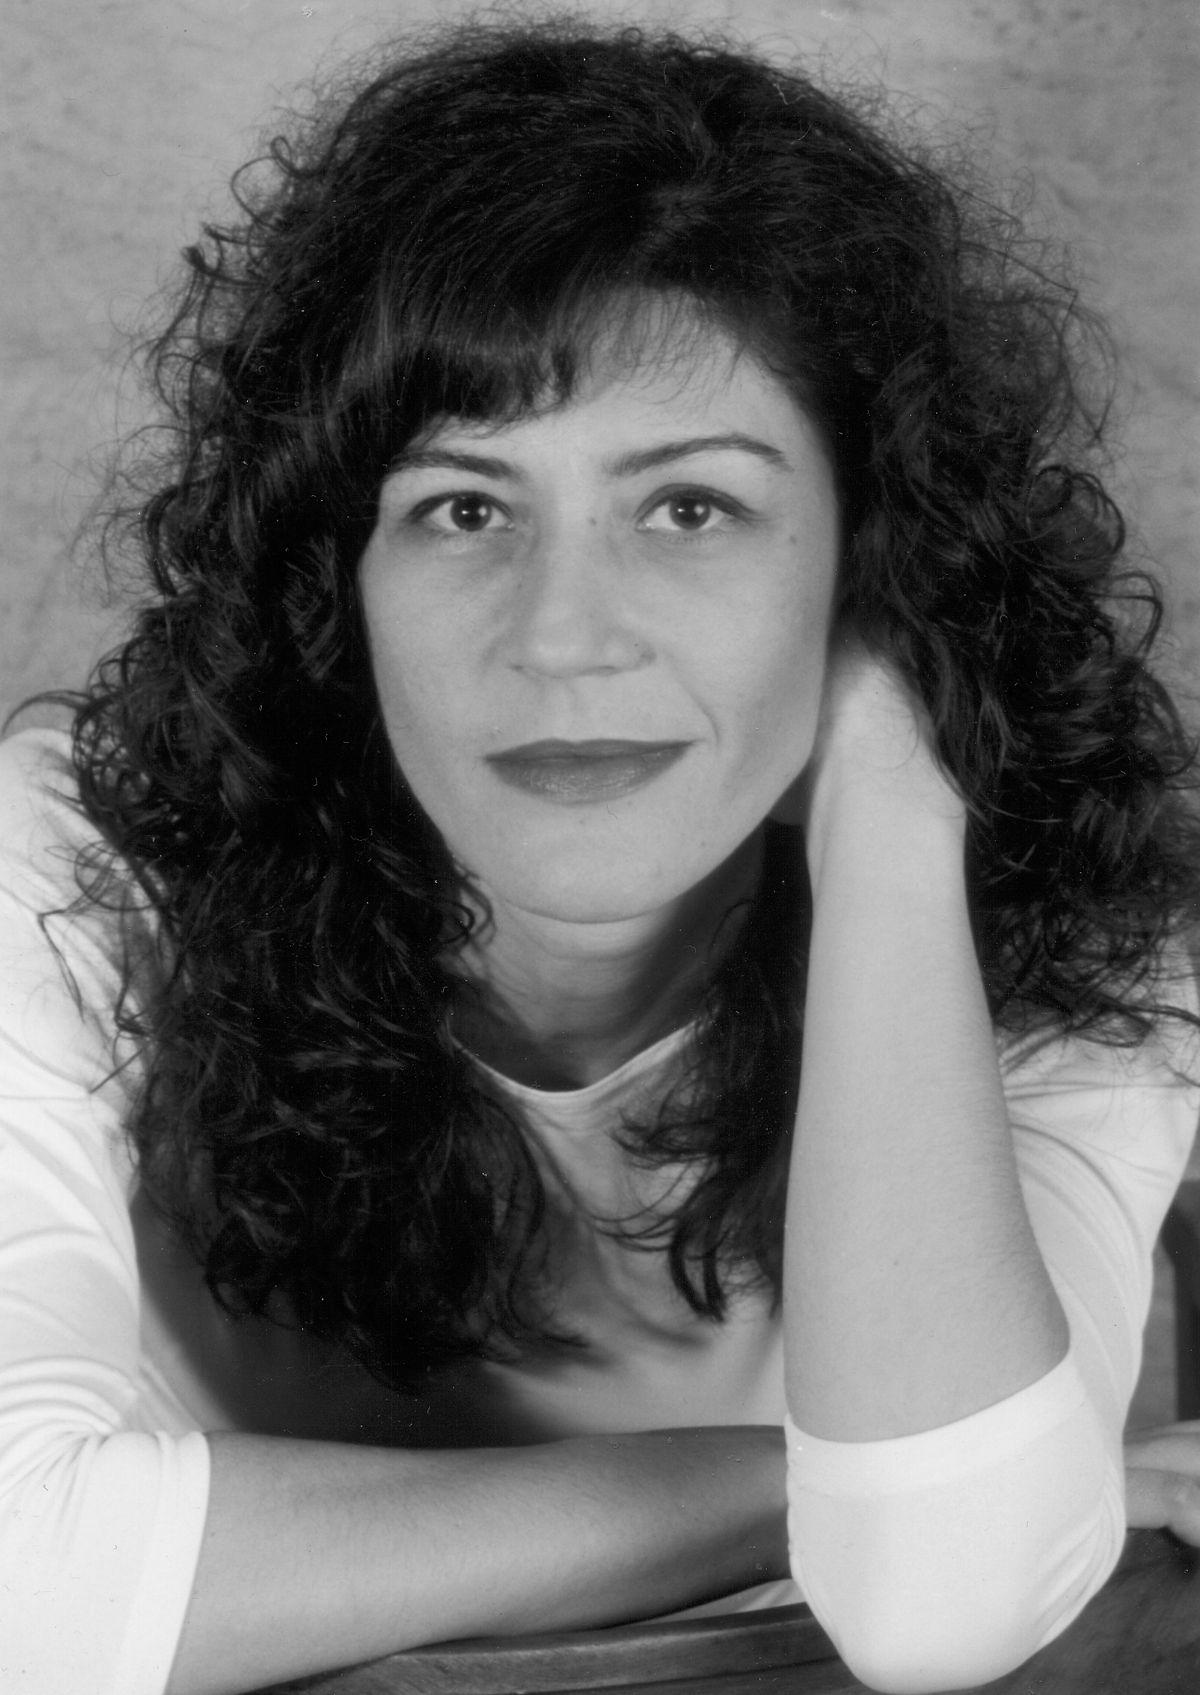 Ángeles López - Wikipedia, la enciclopedia libre